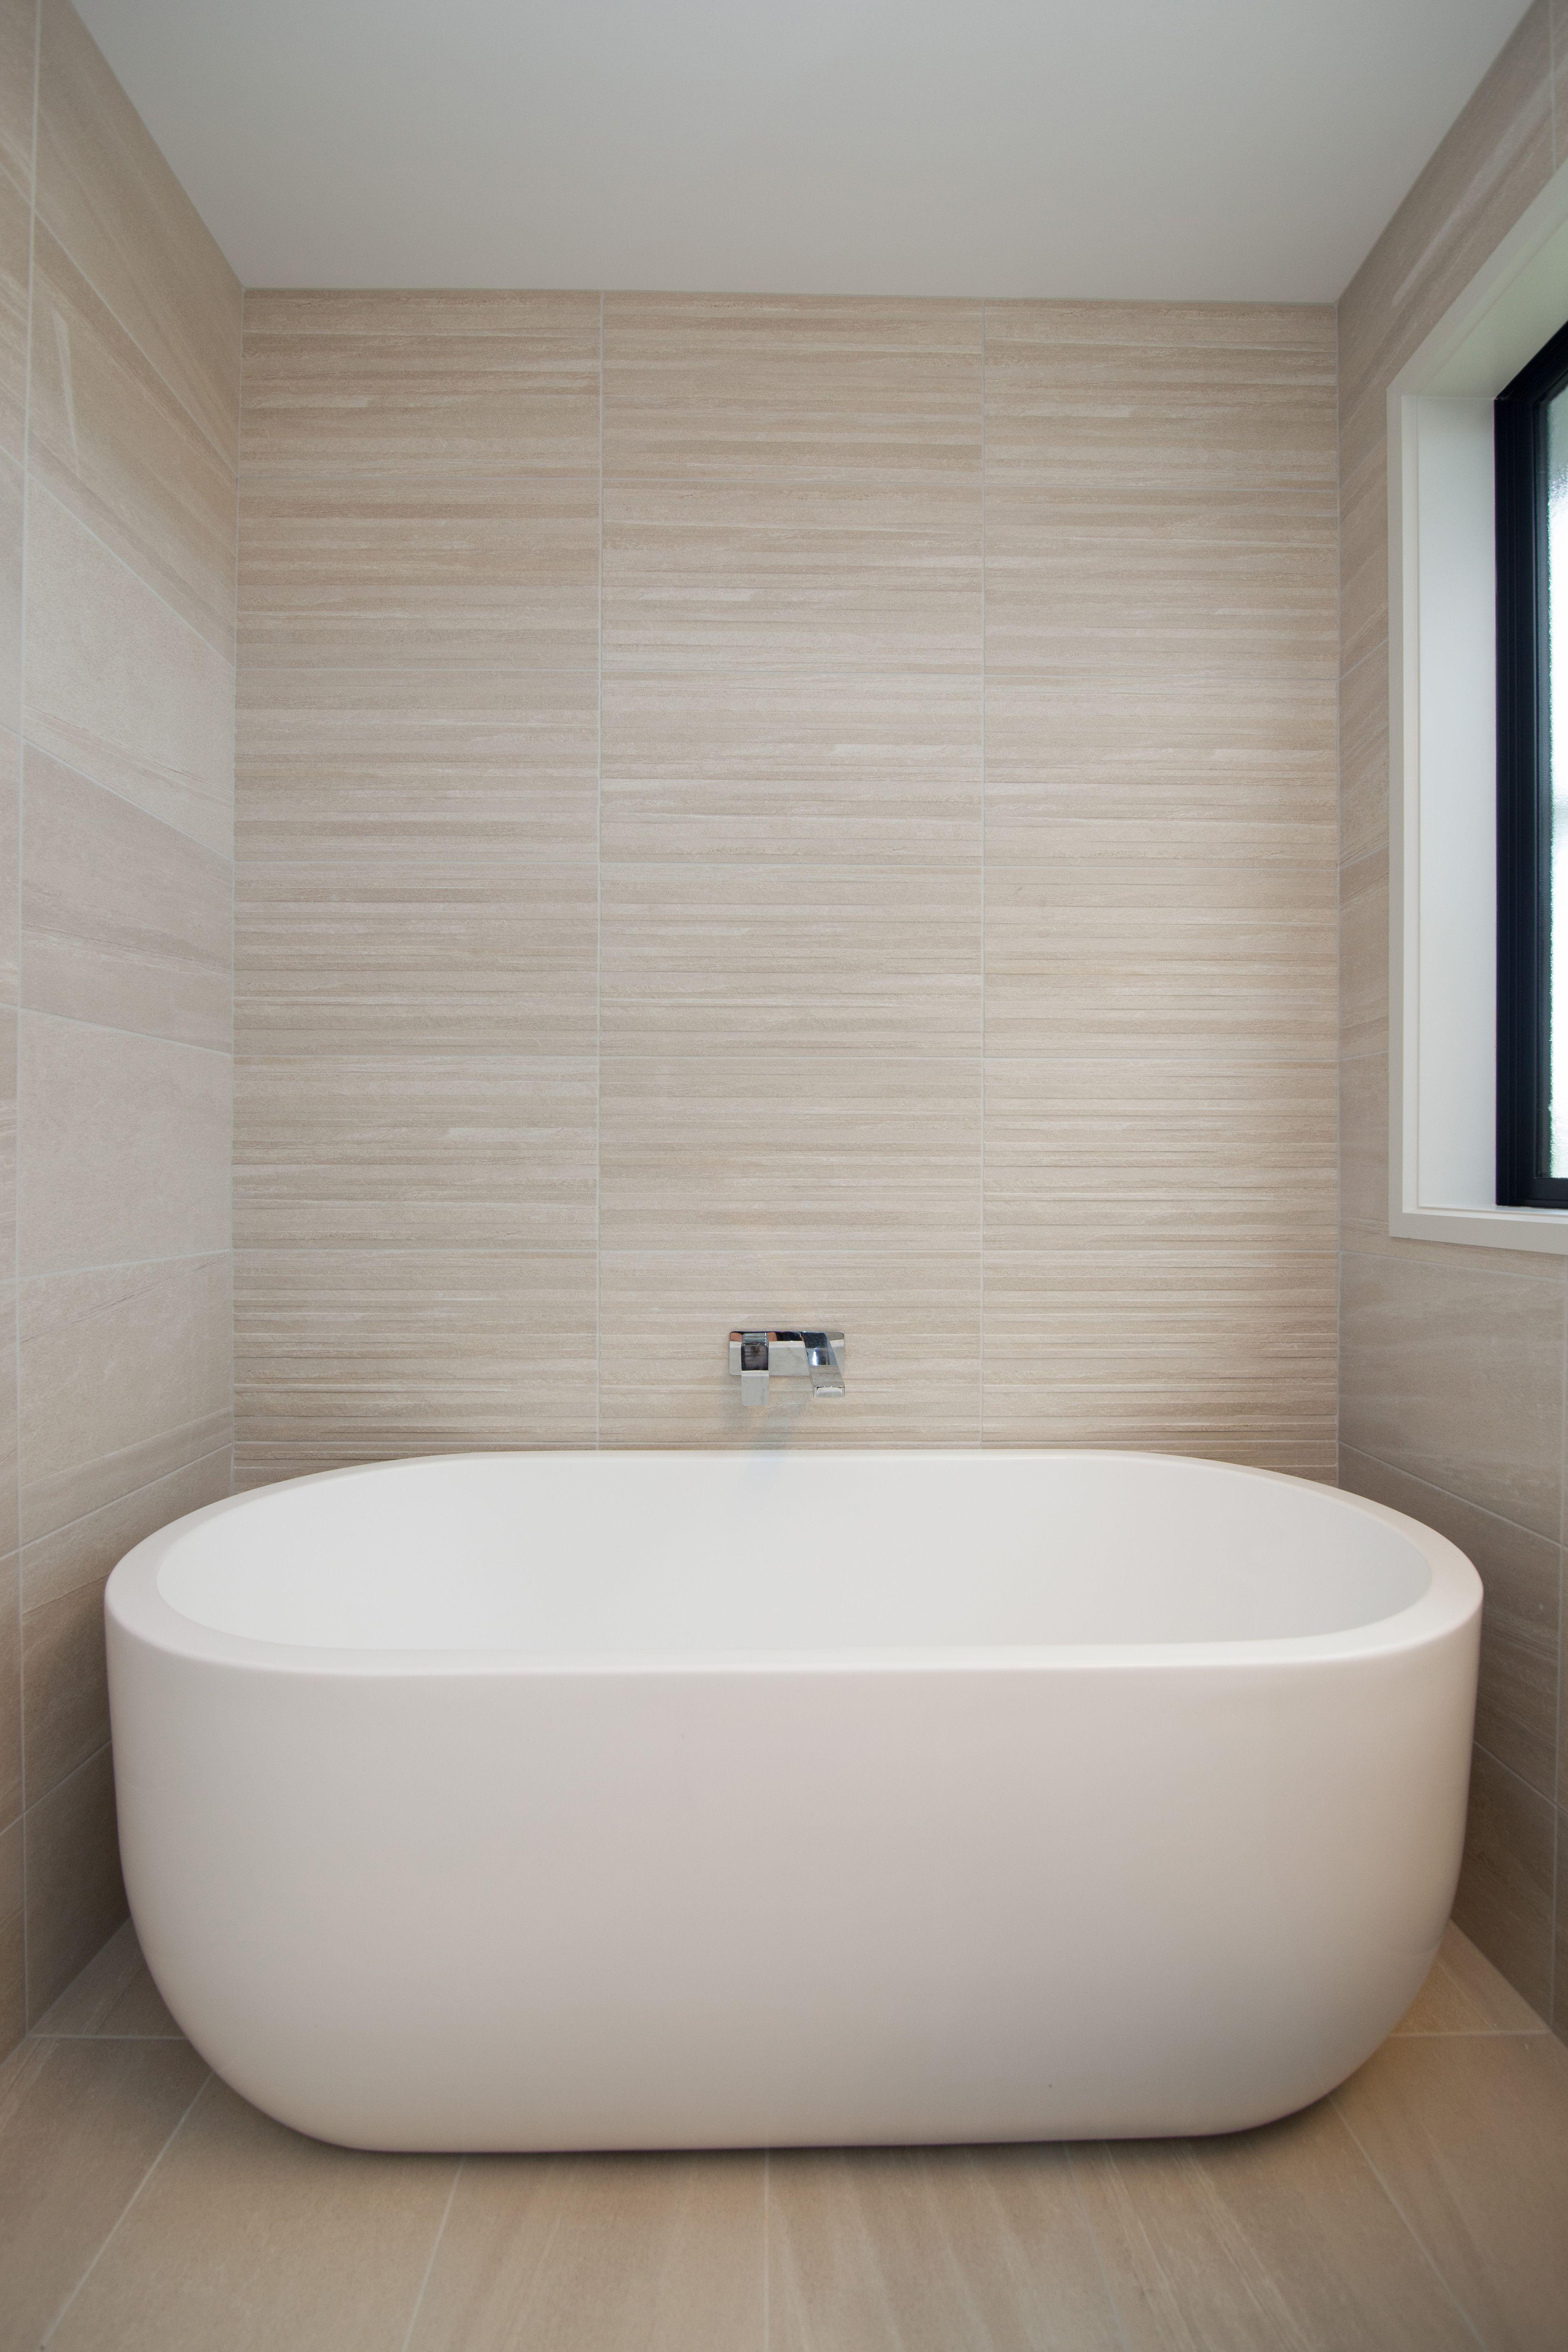 Sit and soak... time for a bath? | SH: Beachlands | Pinterest | Bath ...